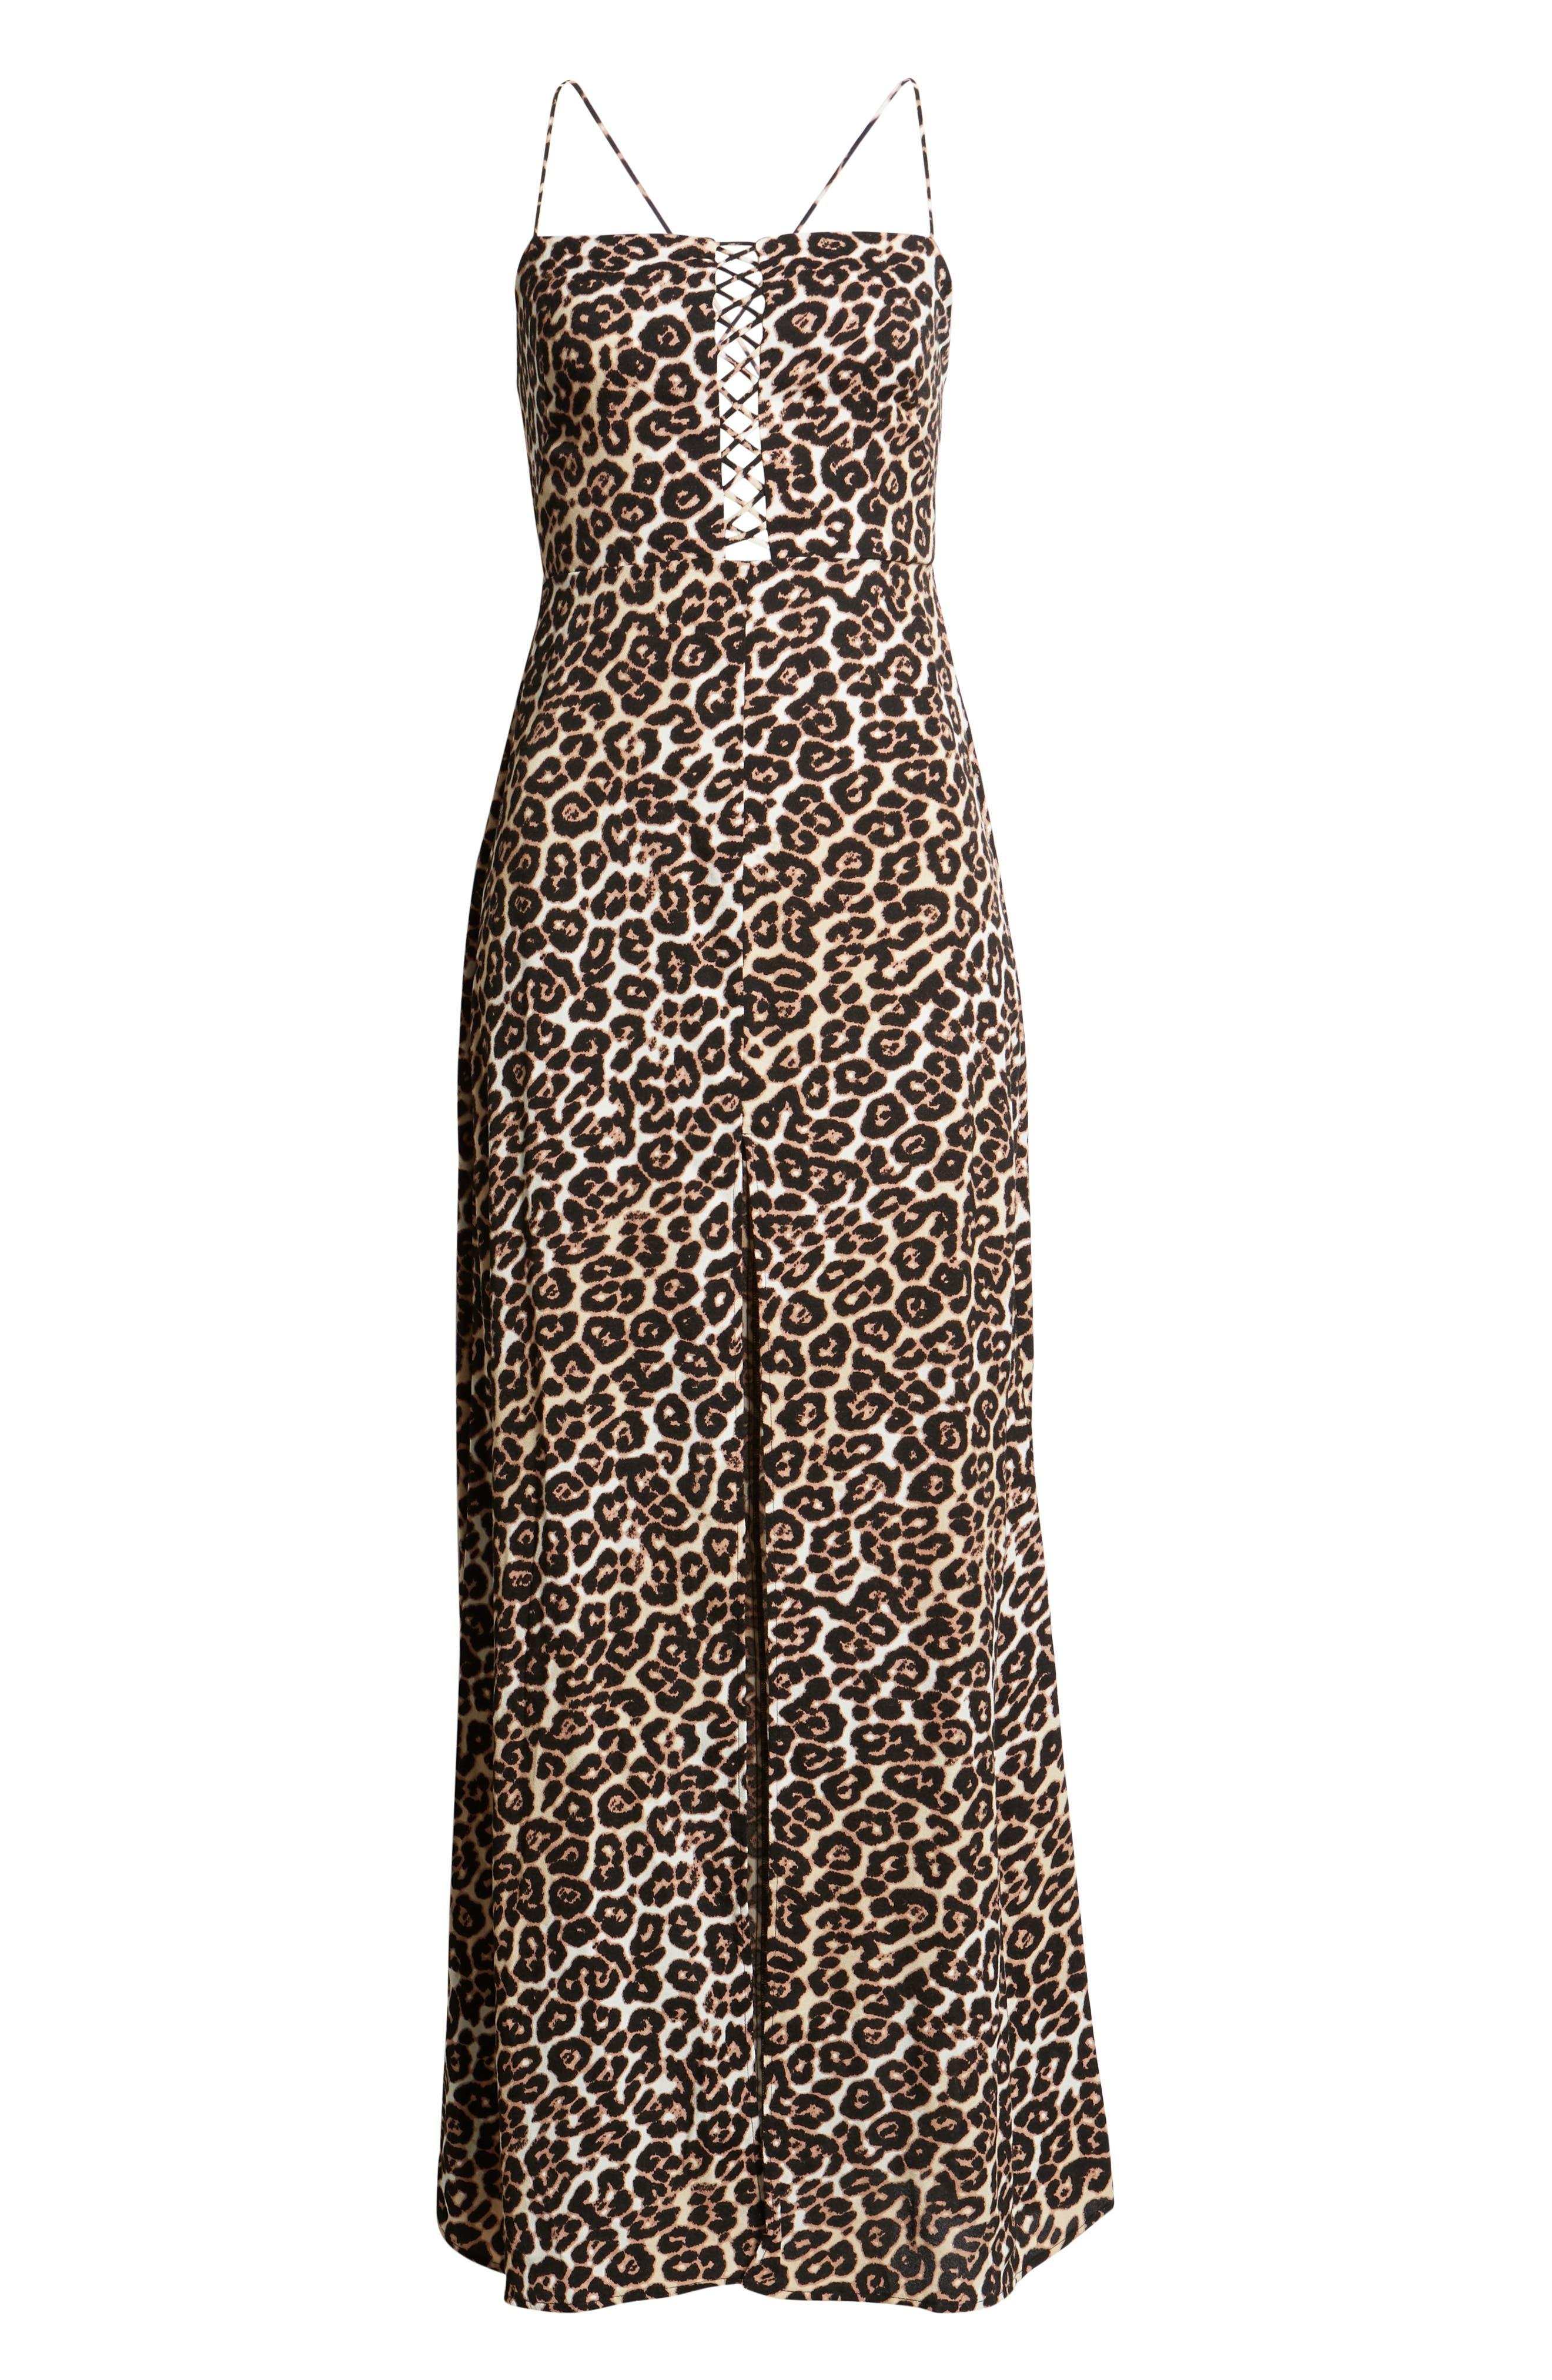 Aryn Lattice Detail Dress,                             Alternate thumbnail 7, color,                             LEOPARD